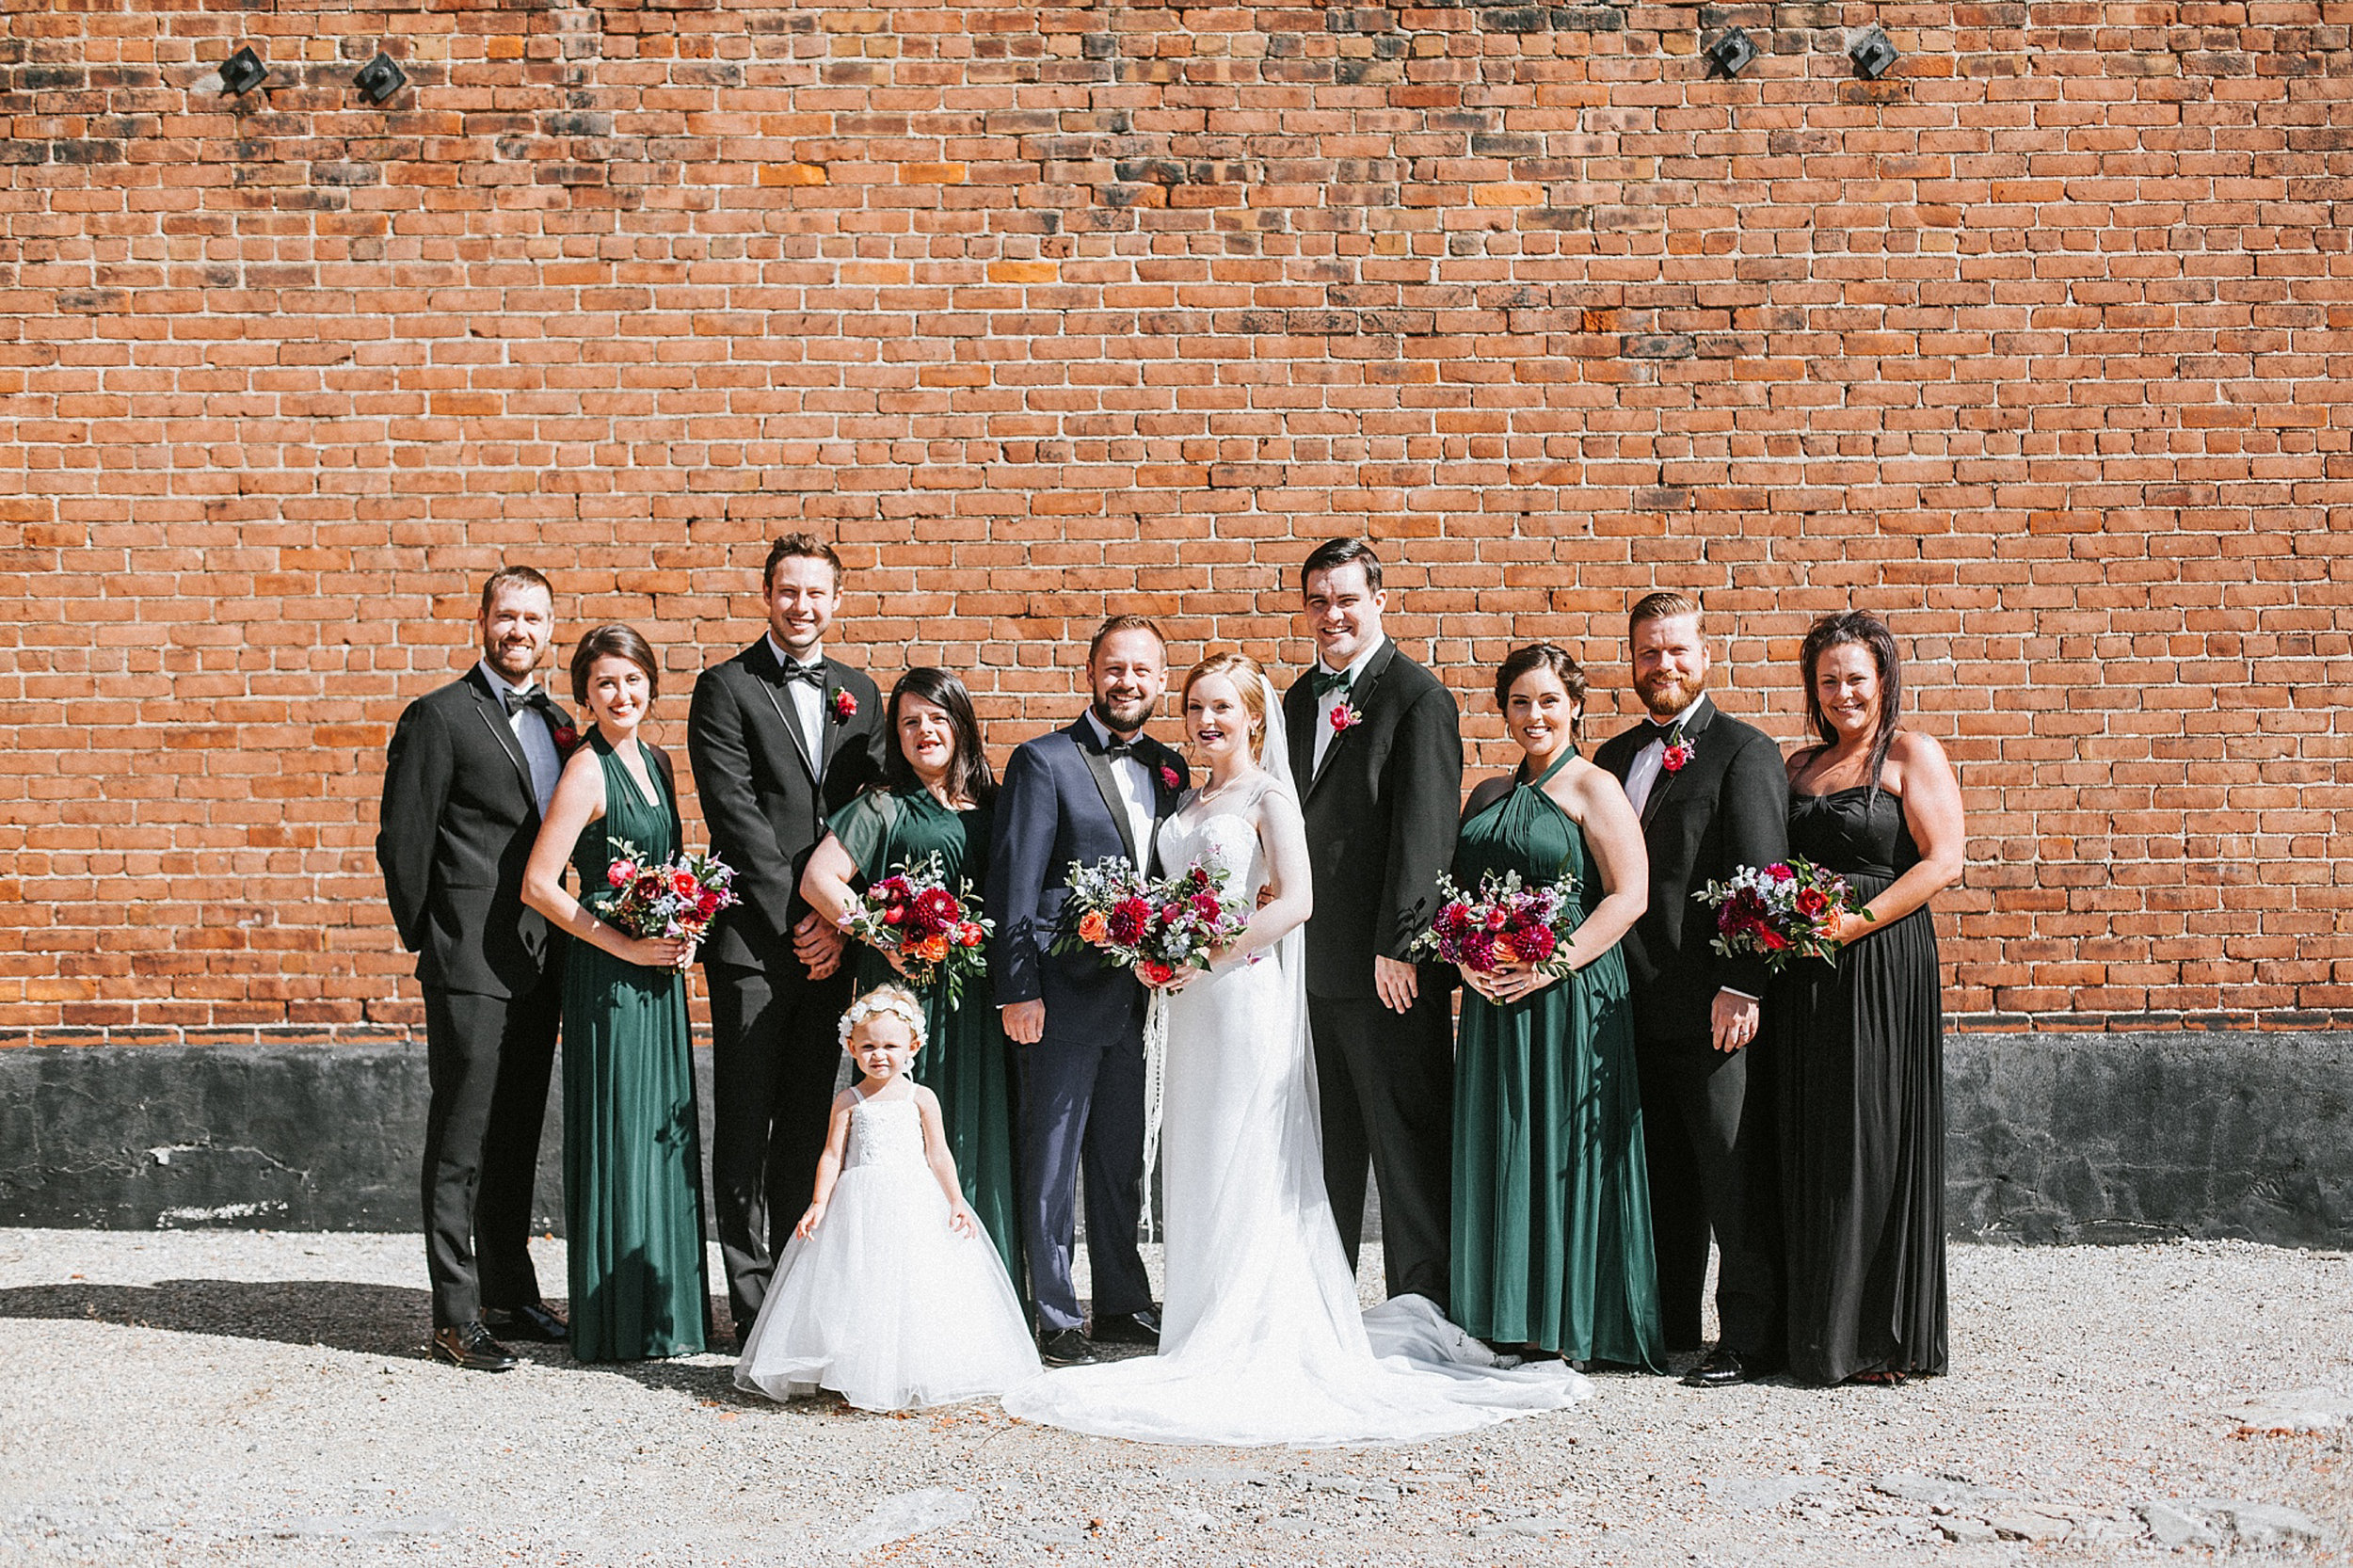 Brooke Townsend Photography - Ohio Wedding Photographer-70.jpg